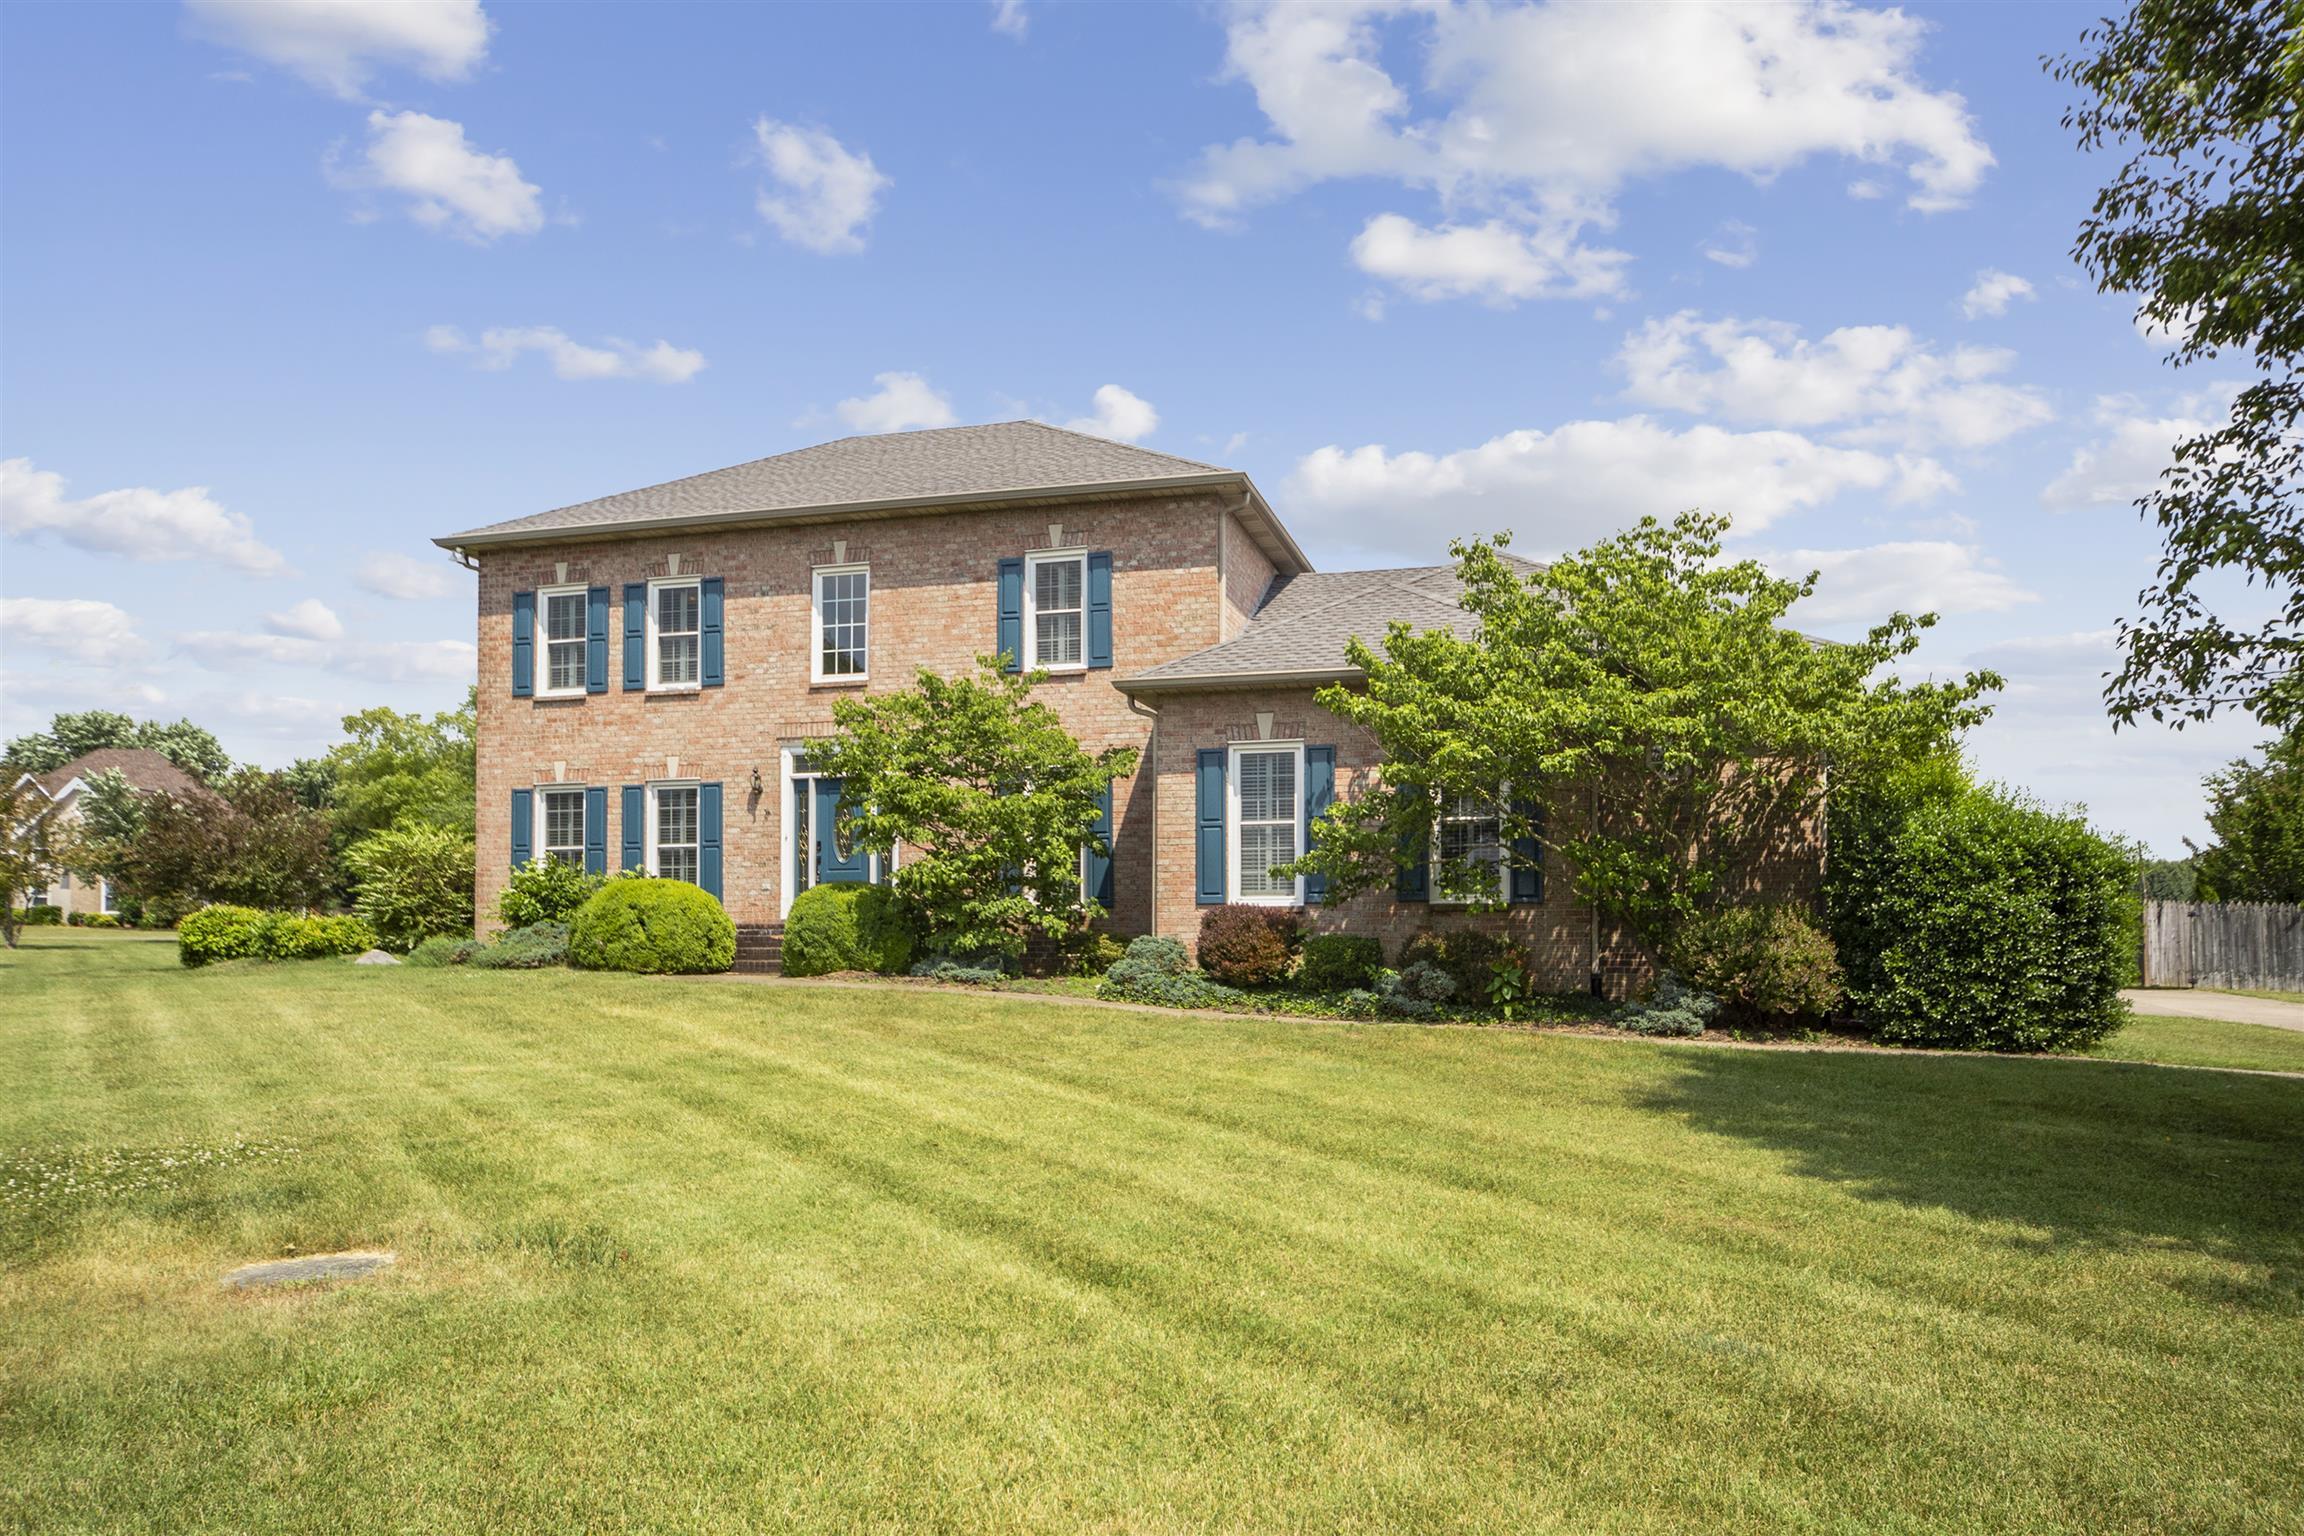 1020 Lake Rise Overlook, Gallatin, TN 37066 - Gallatin, TN real estate listing